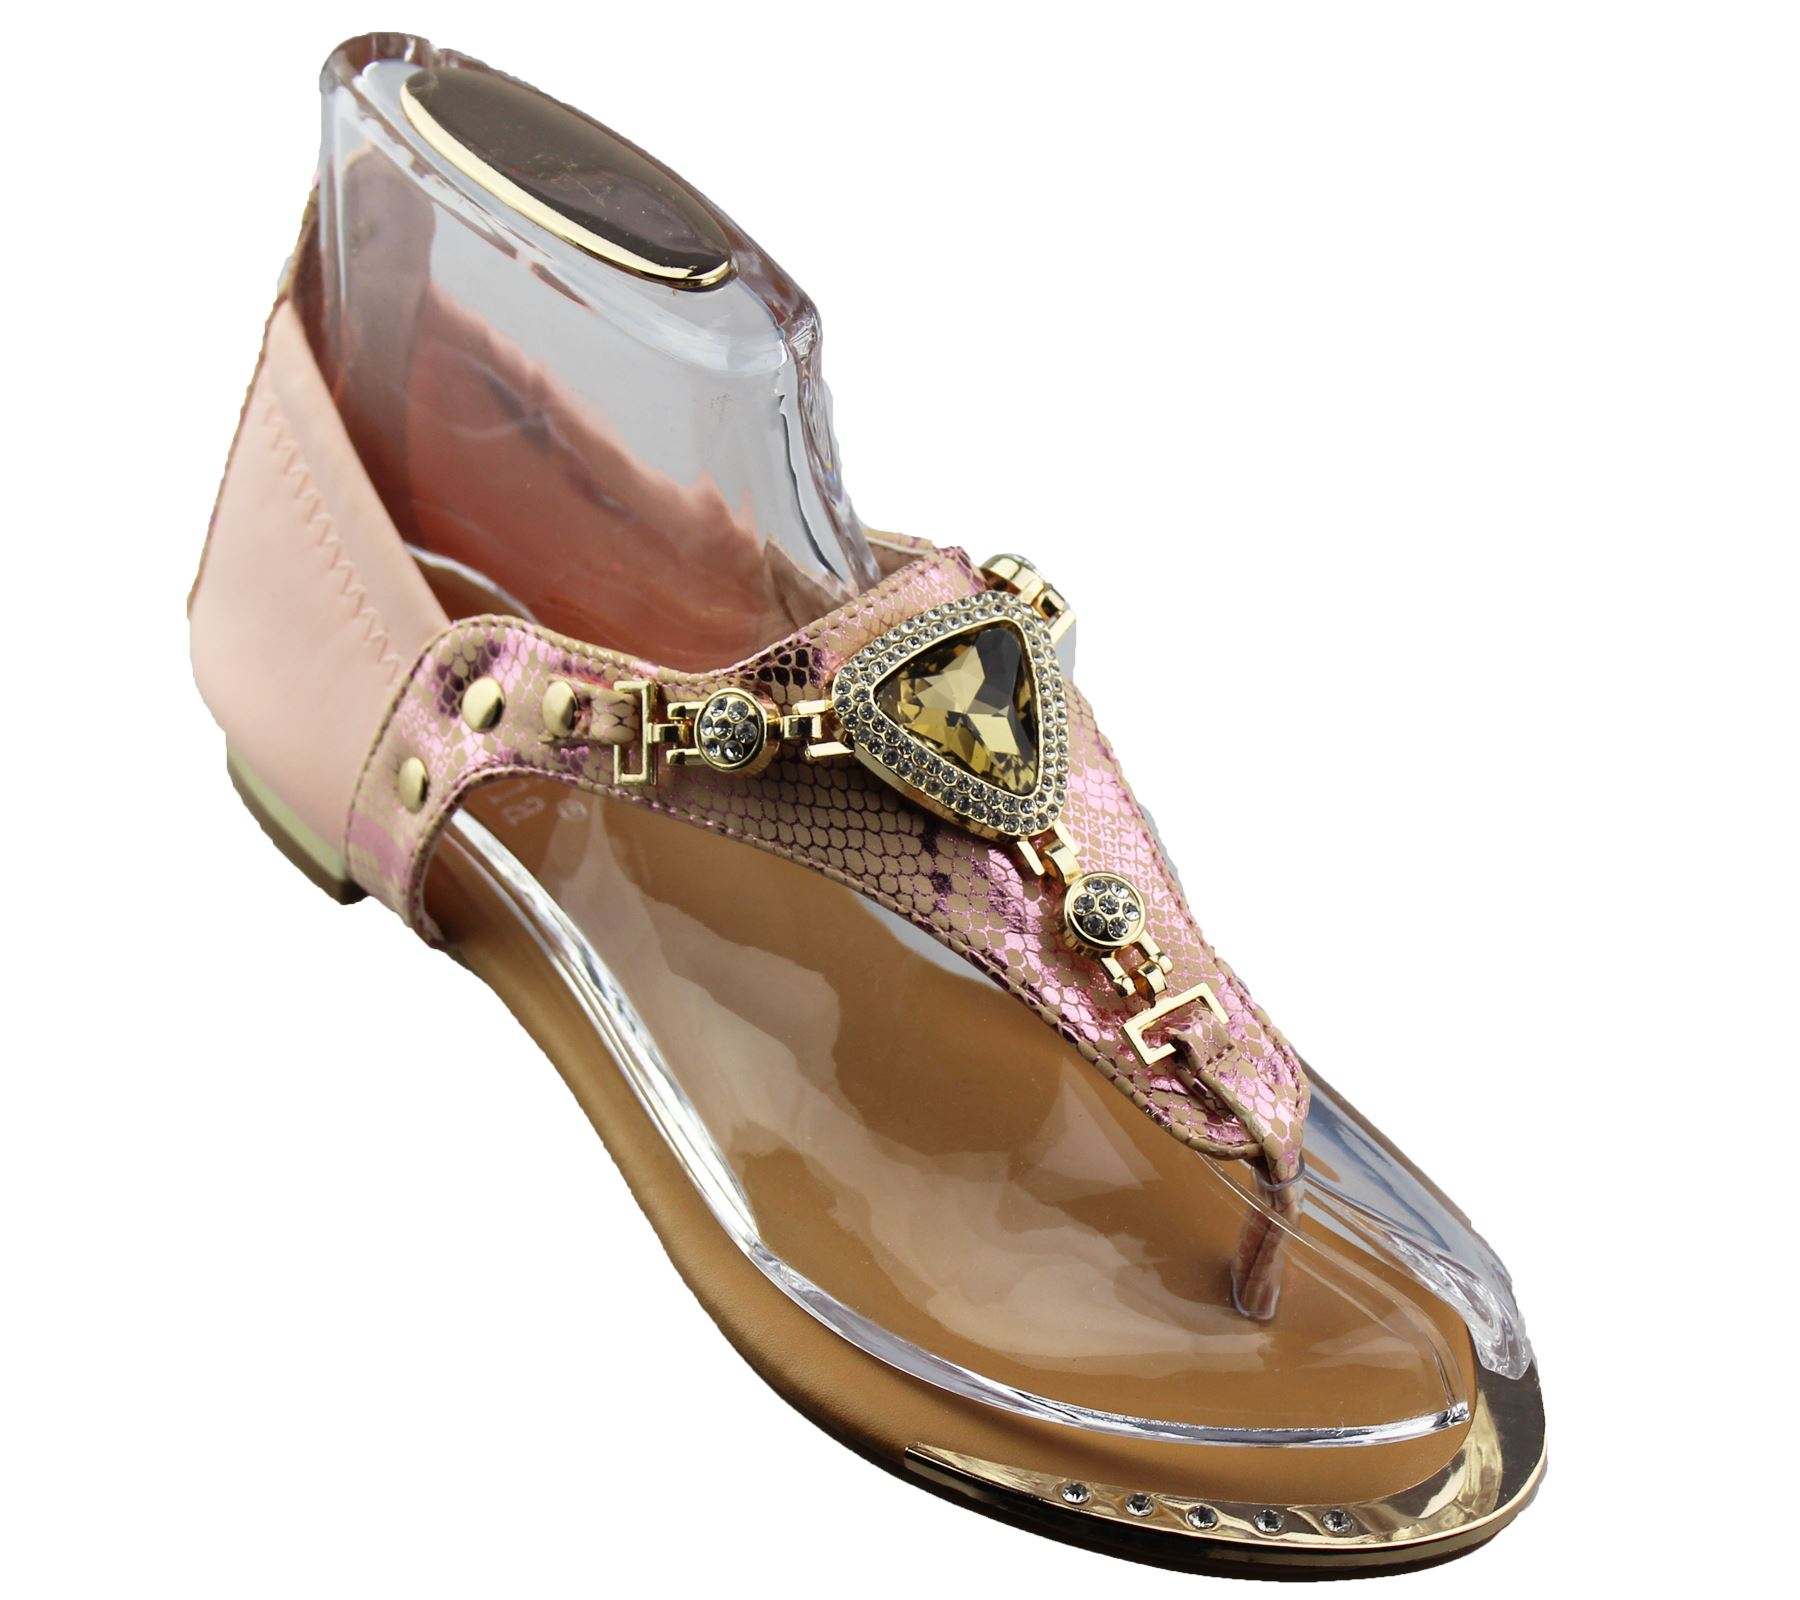 Womens-Flat-Summer-Sandals-Ladies-Diamante-Wedding-Toe-Post-Casual-Slipper thumbnail 34